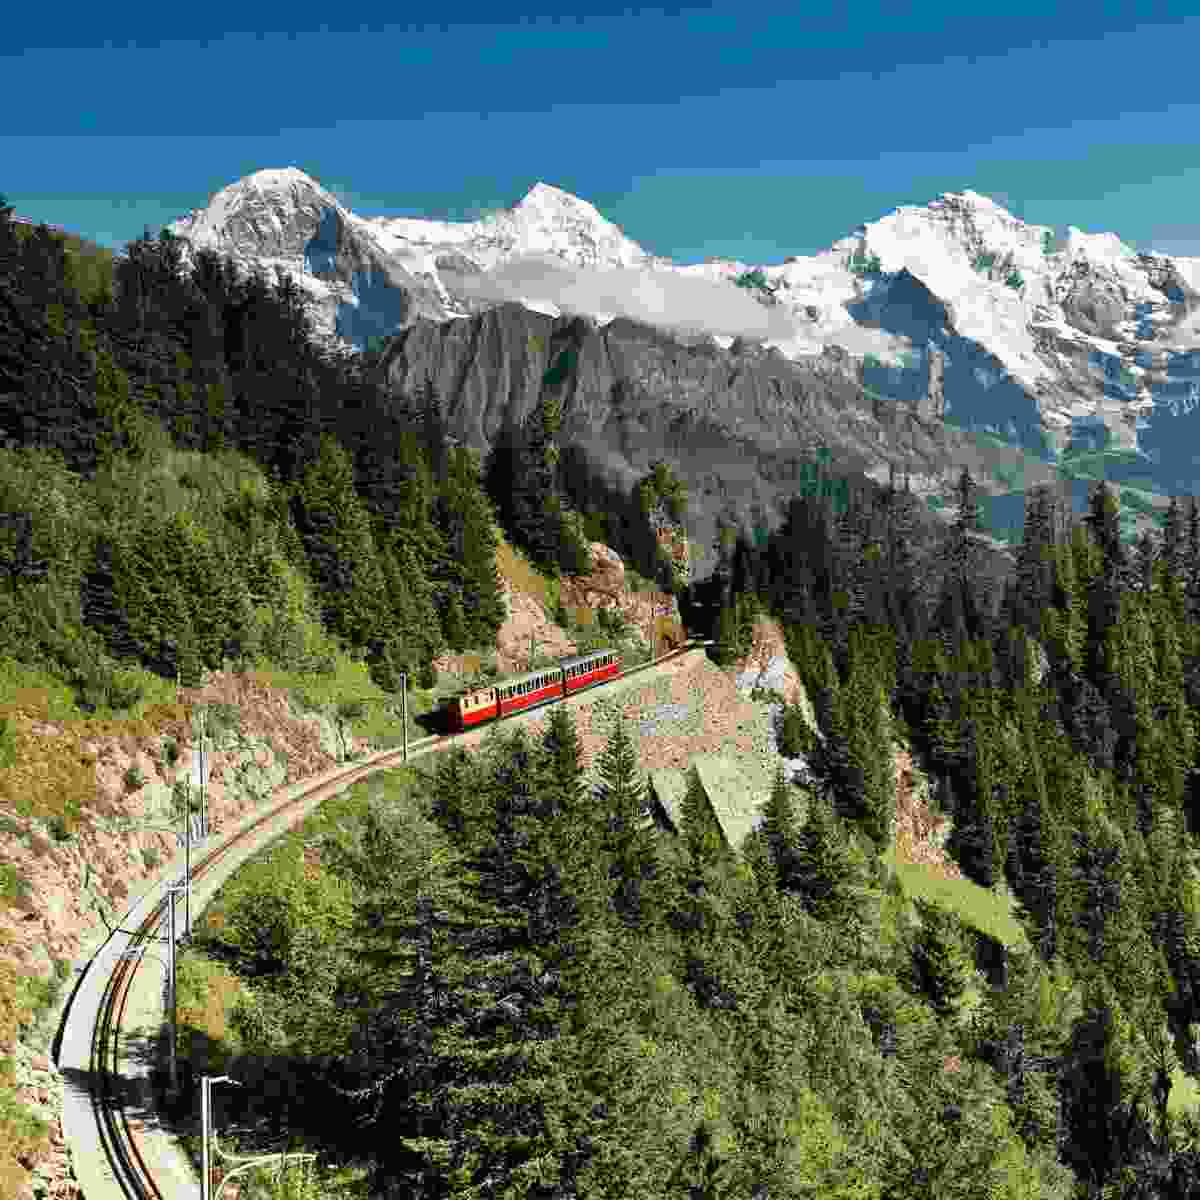 Riding the train through Switzerland